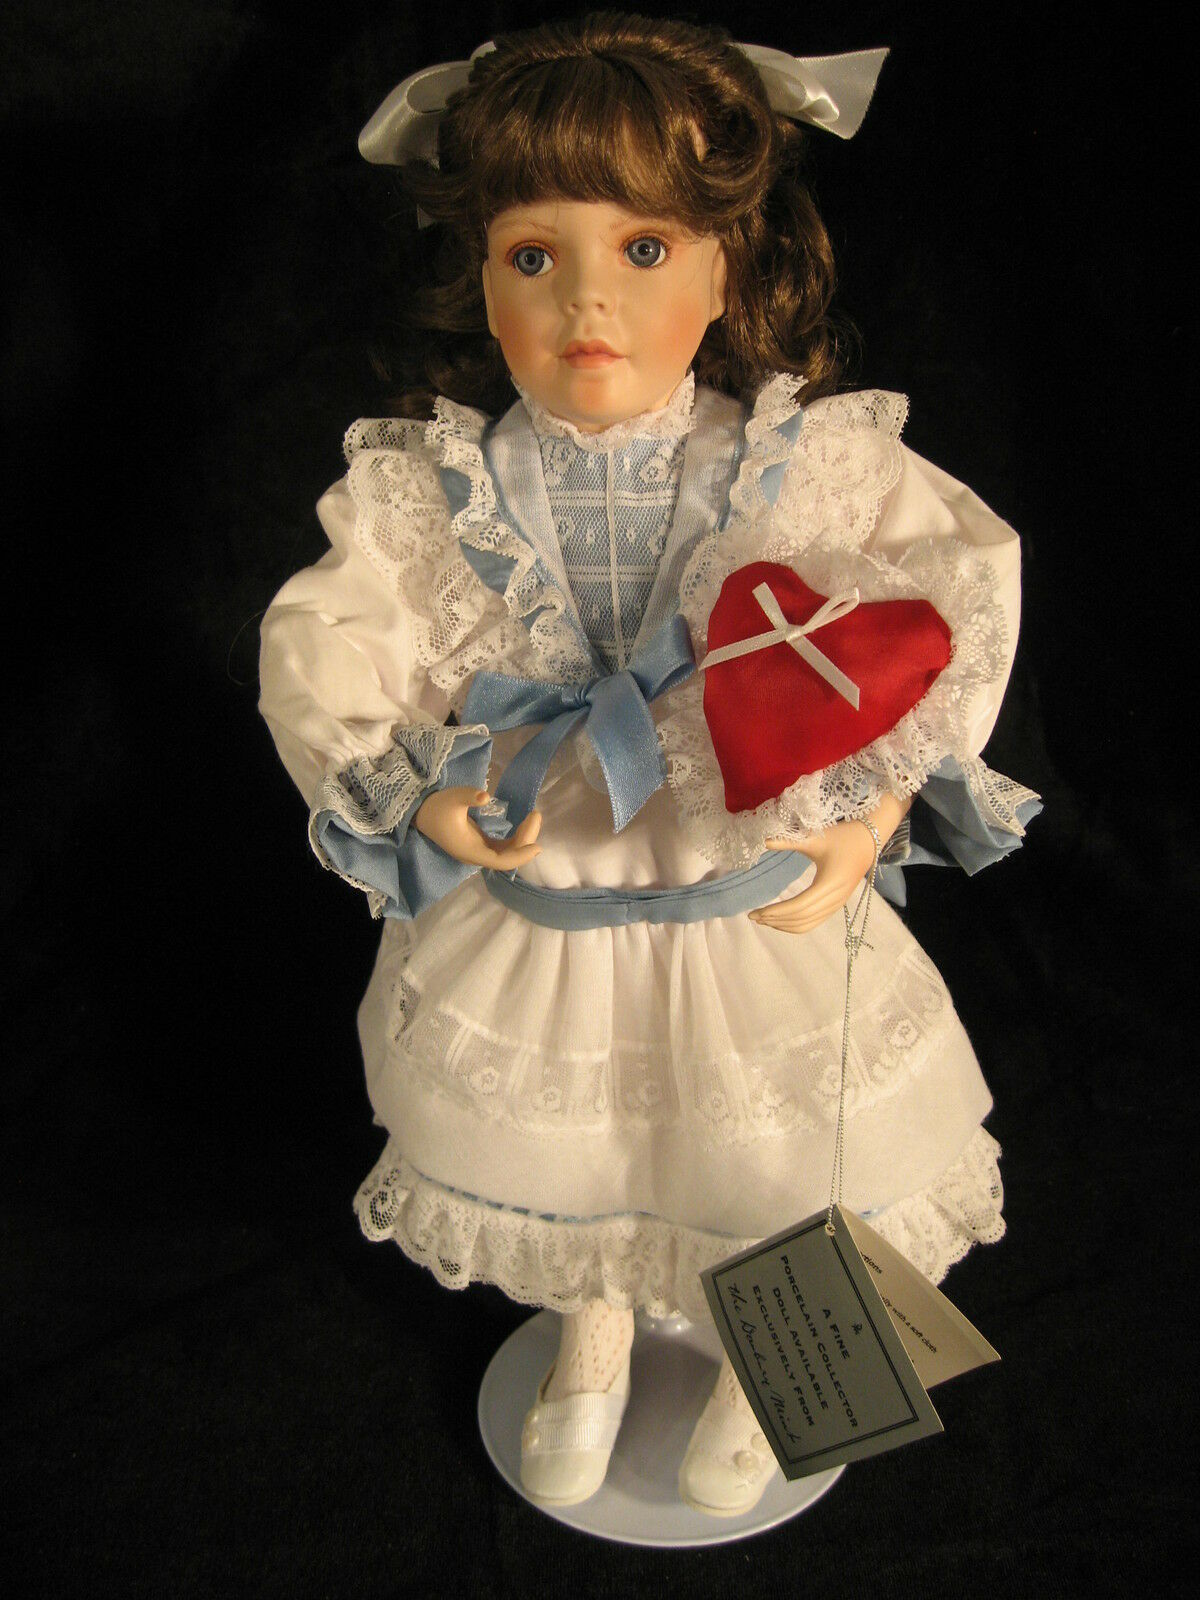 Porcelain Collector Doll   Christina  by Jan Garnett  from the Danbury Mint 1994